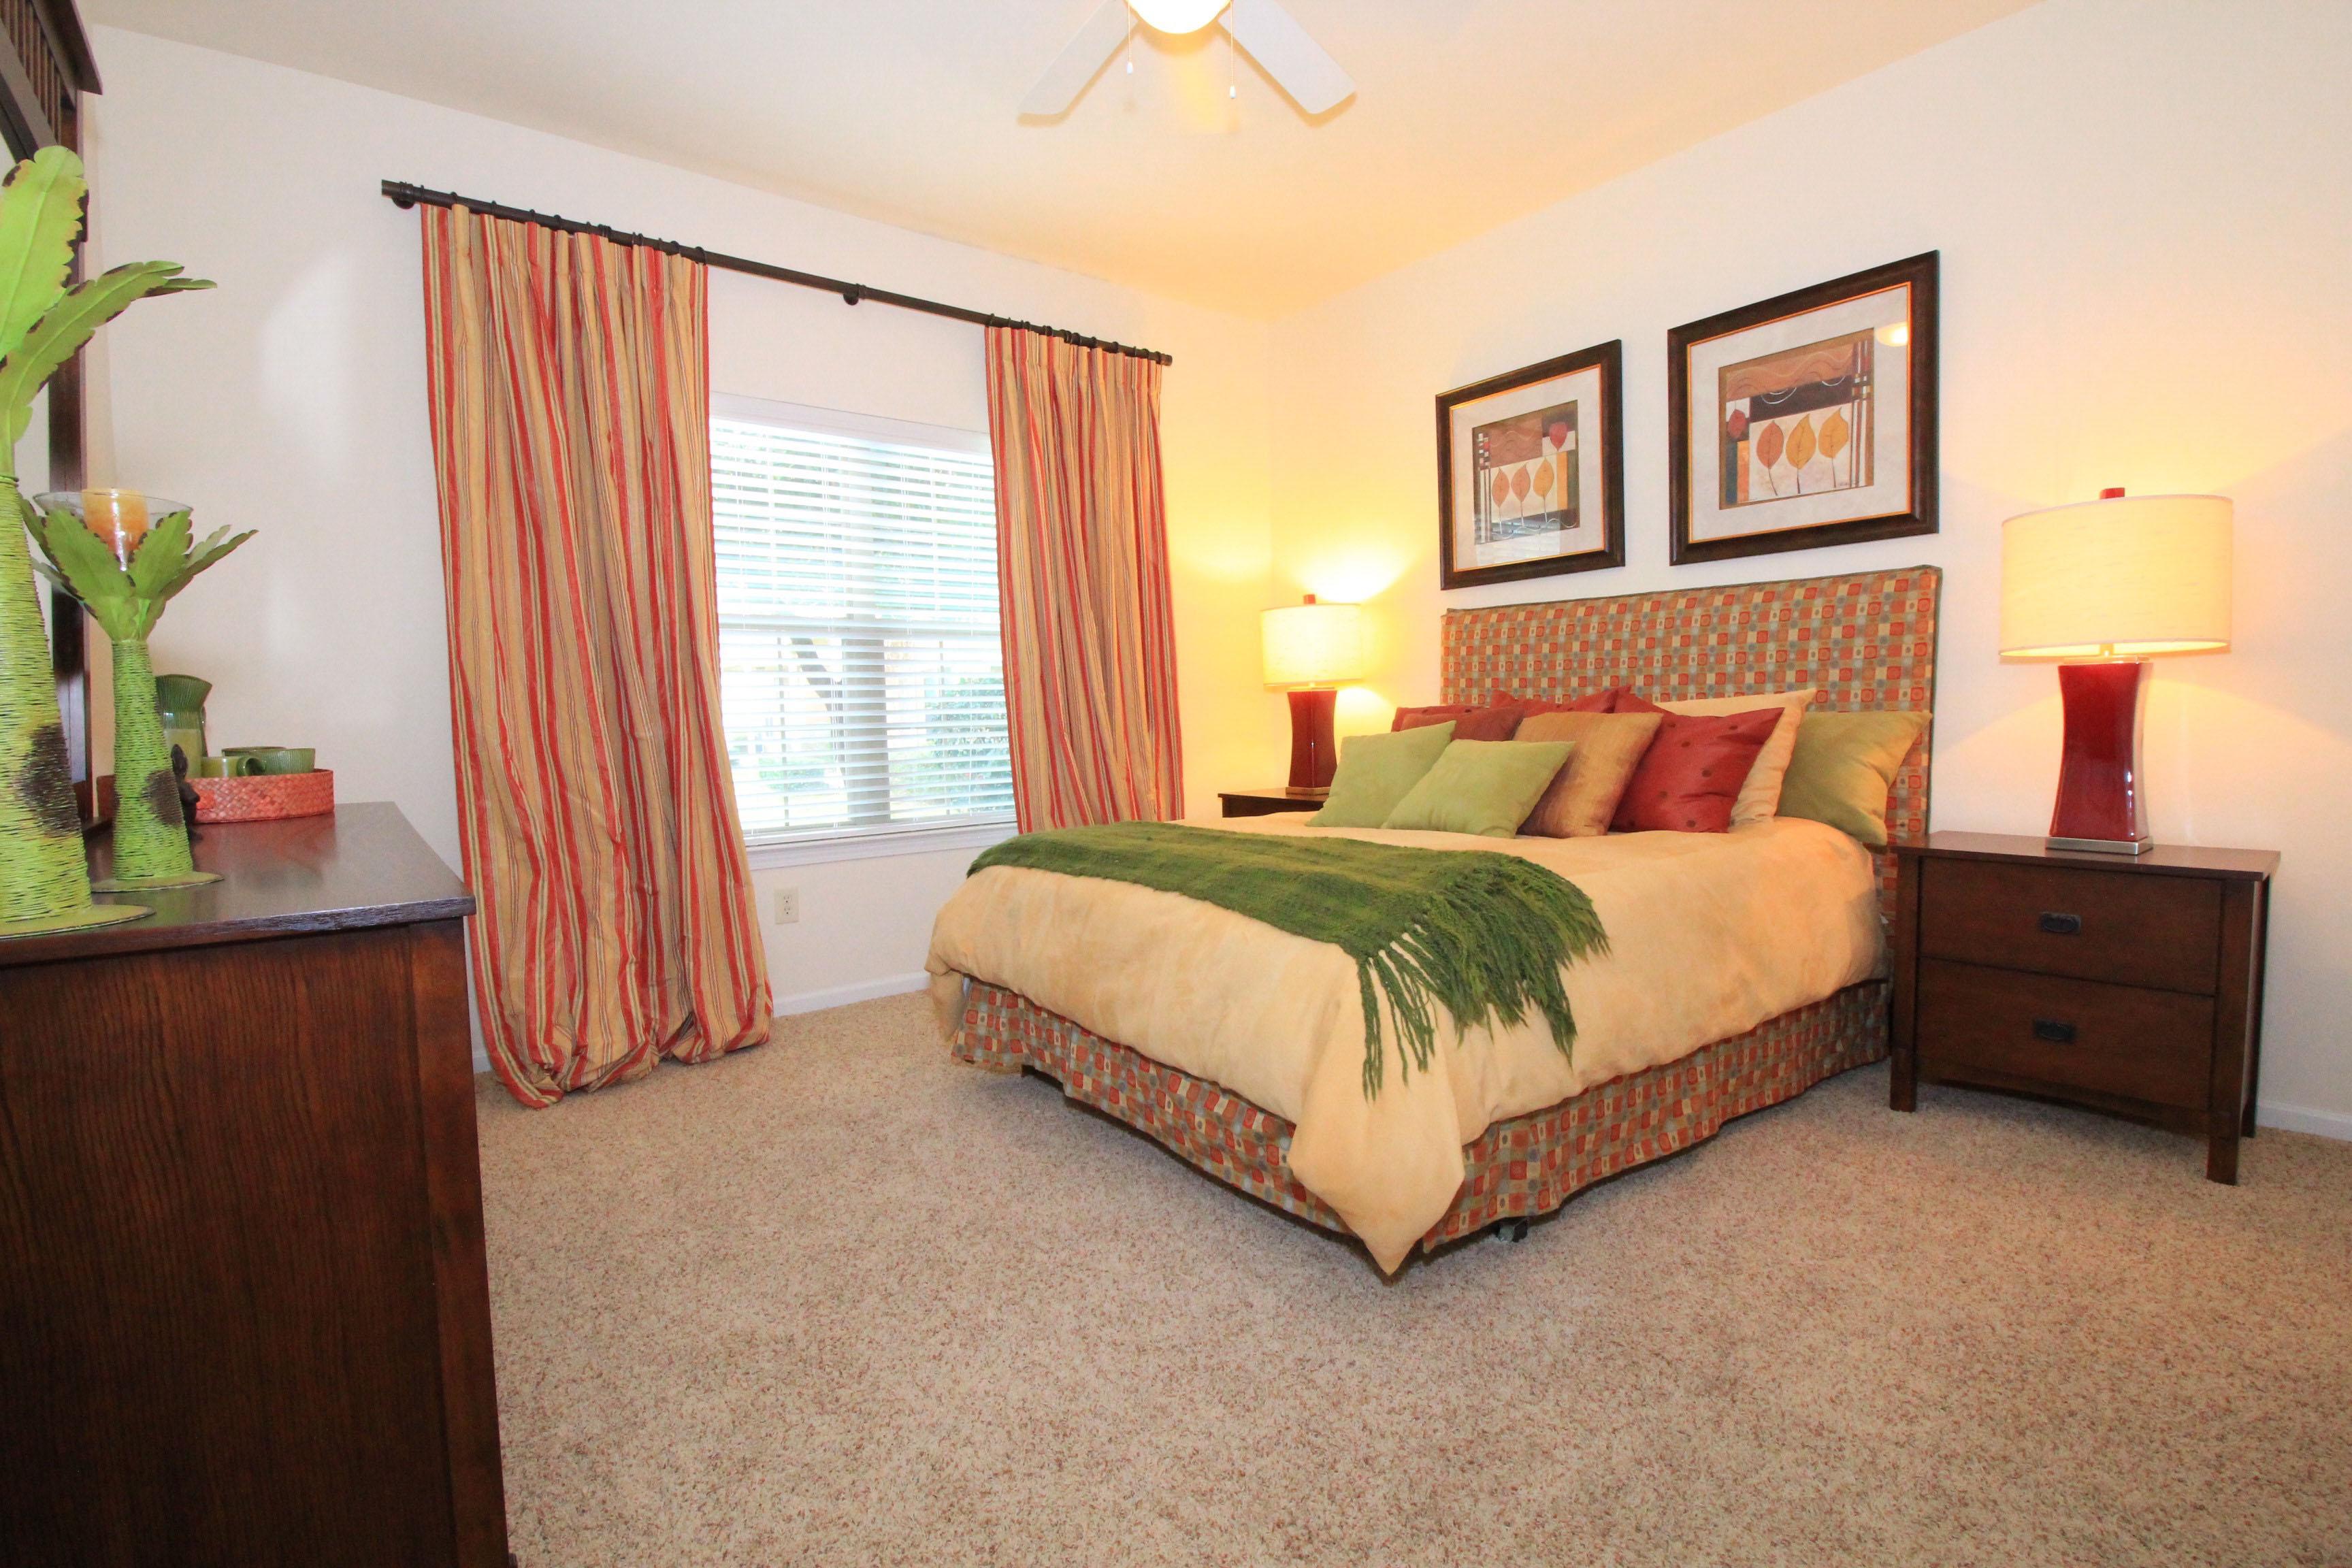 Master Bedroom at The Oxford at Estonia Apartments in San Antonio, TX